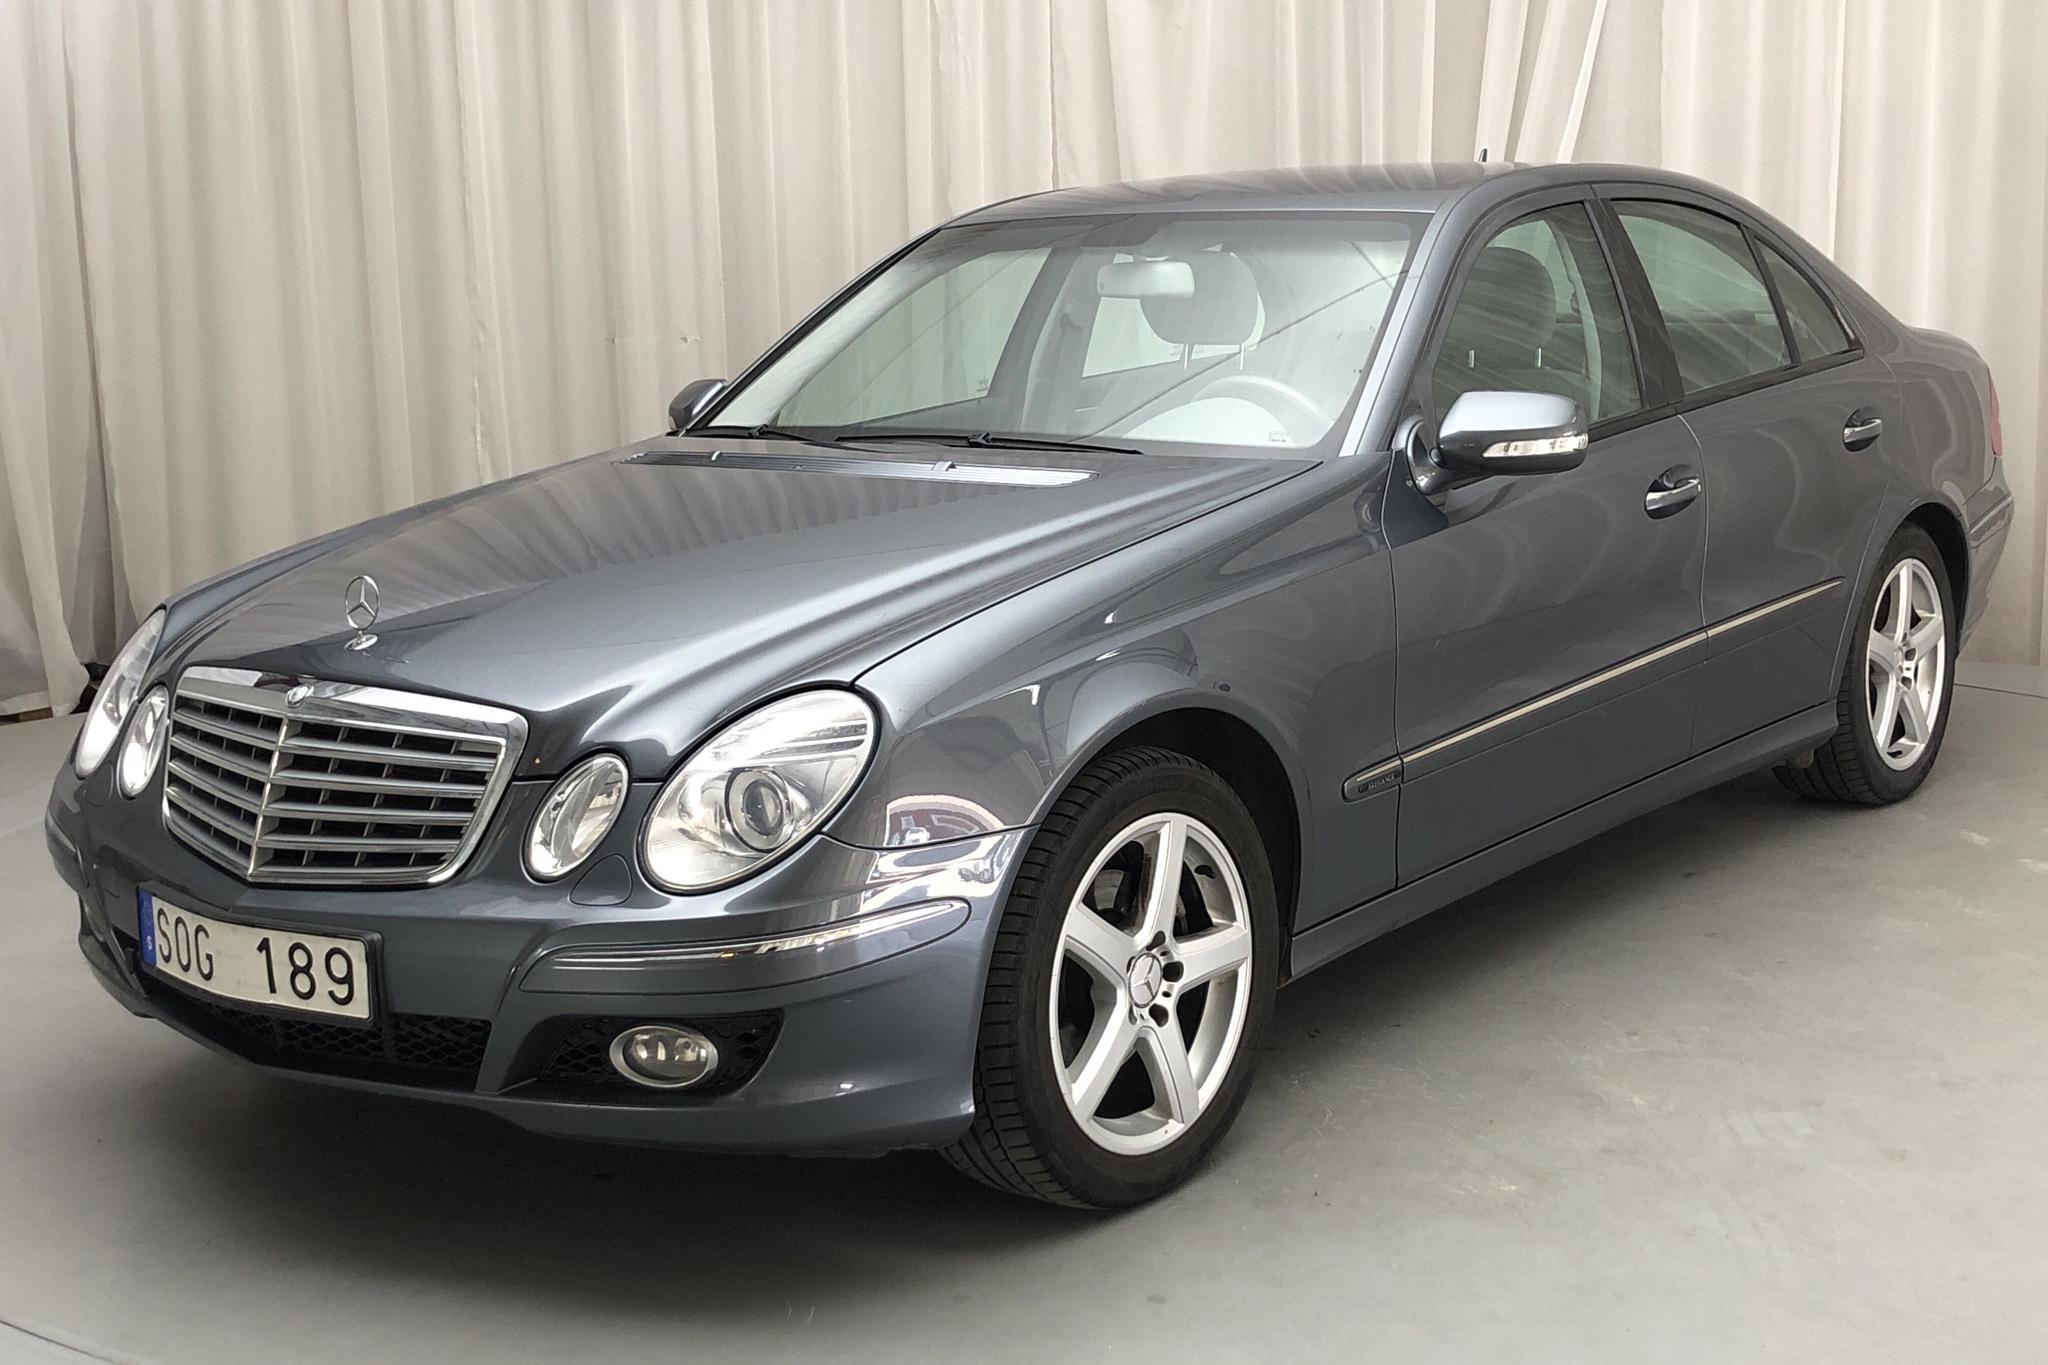 Mercedes E 280 W211 (231hk) - 16 705 mil - Automat - grå - 2007